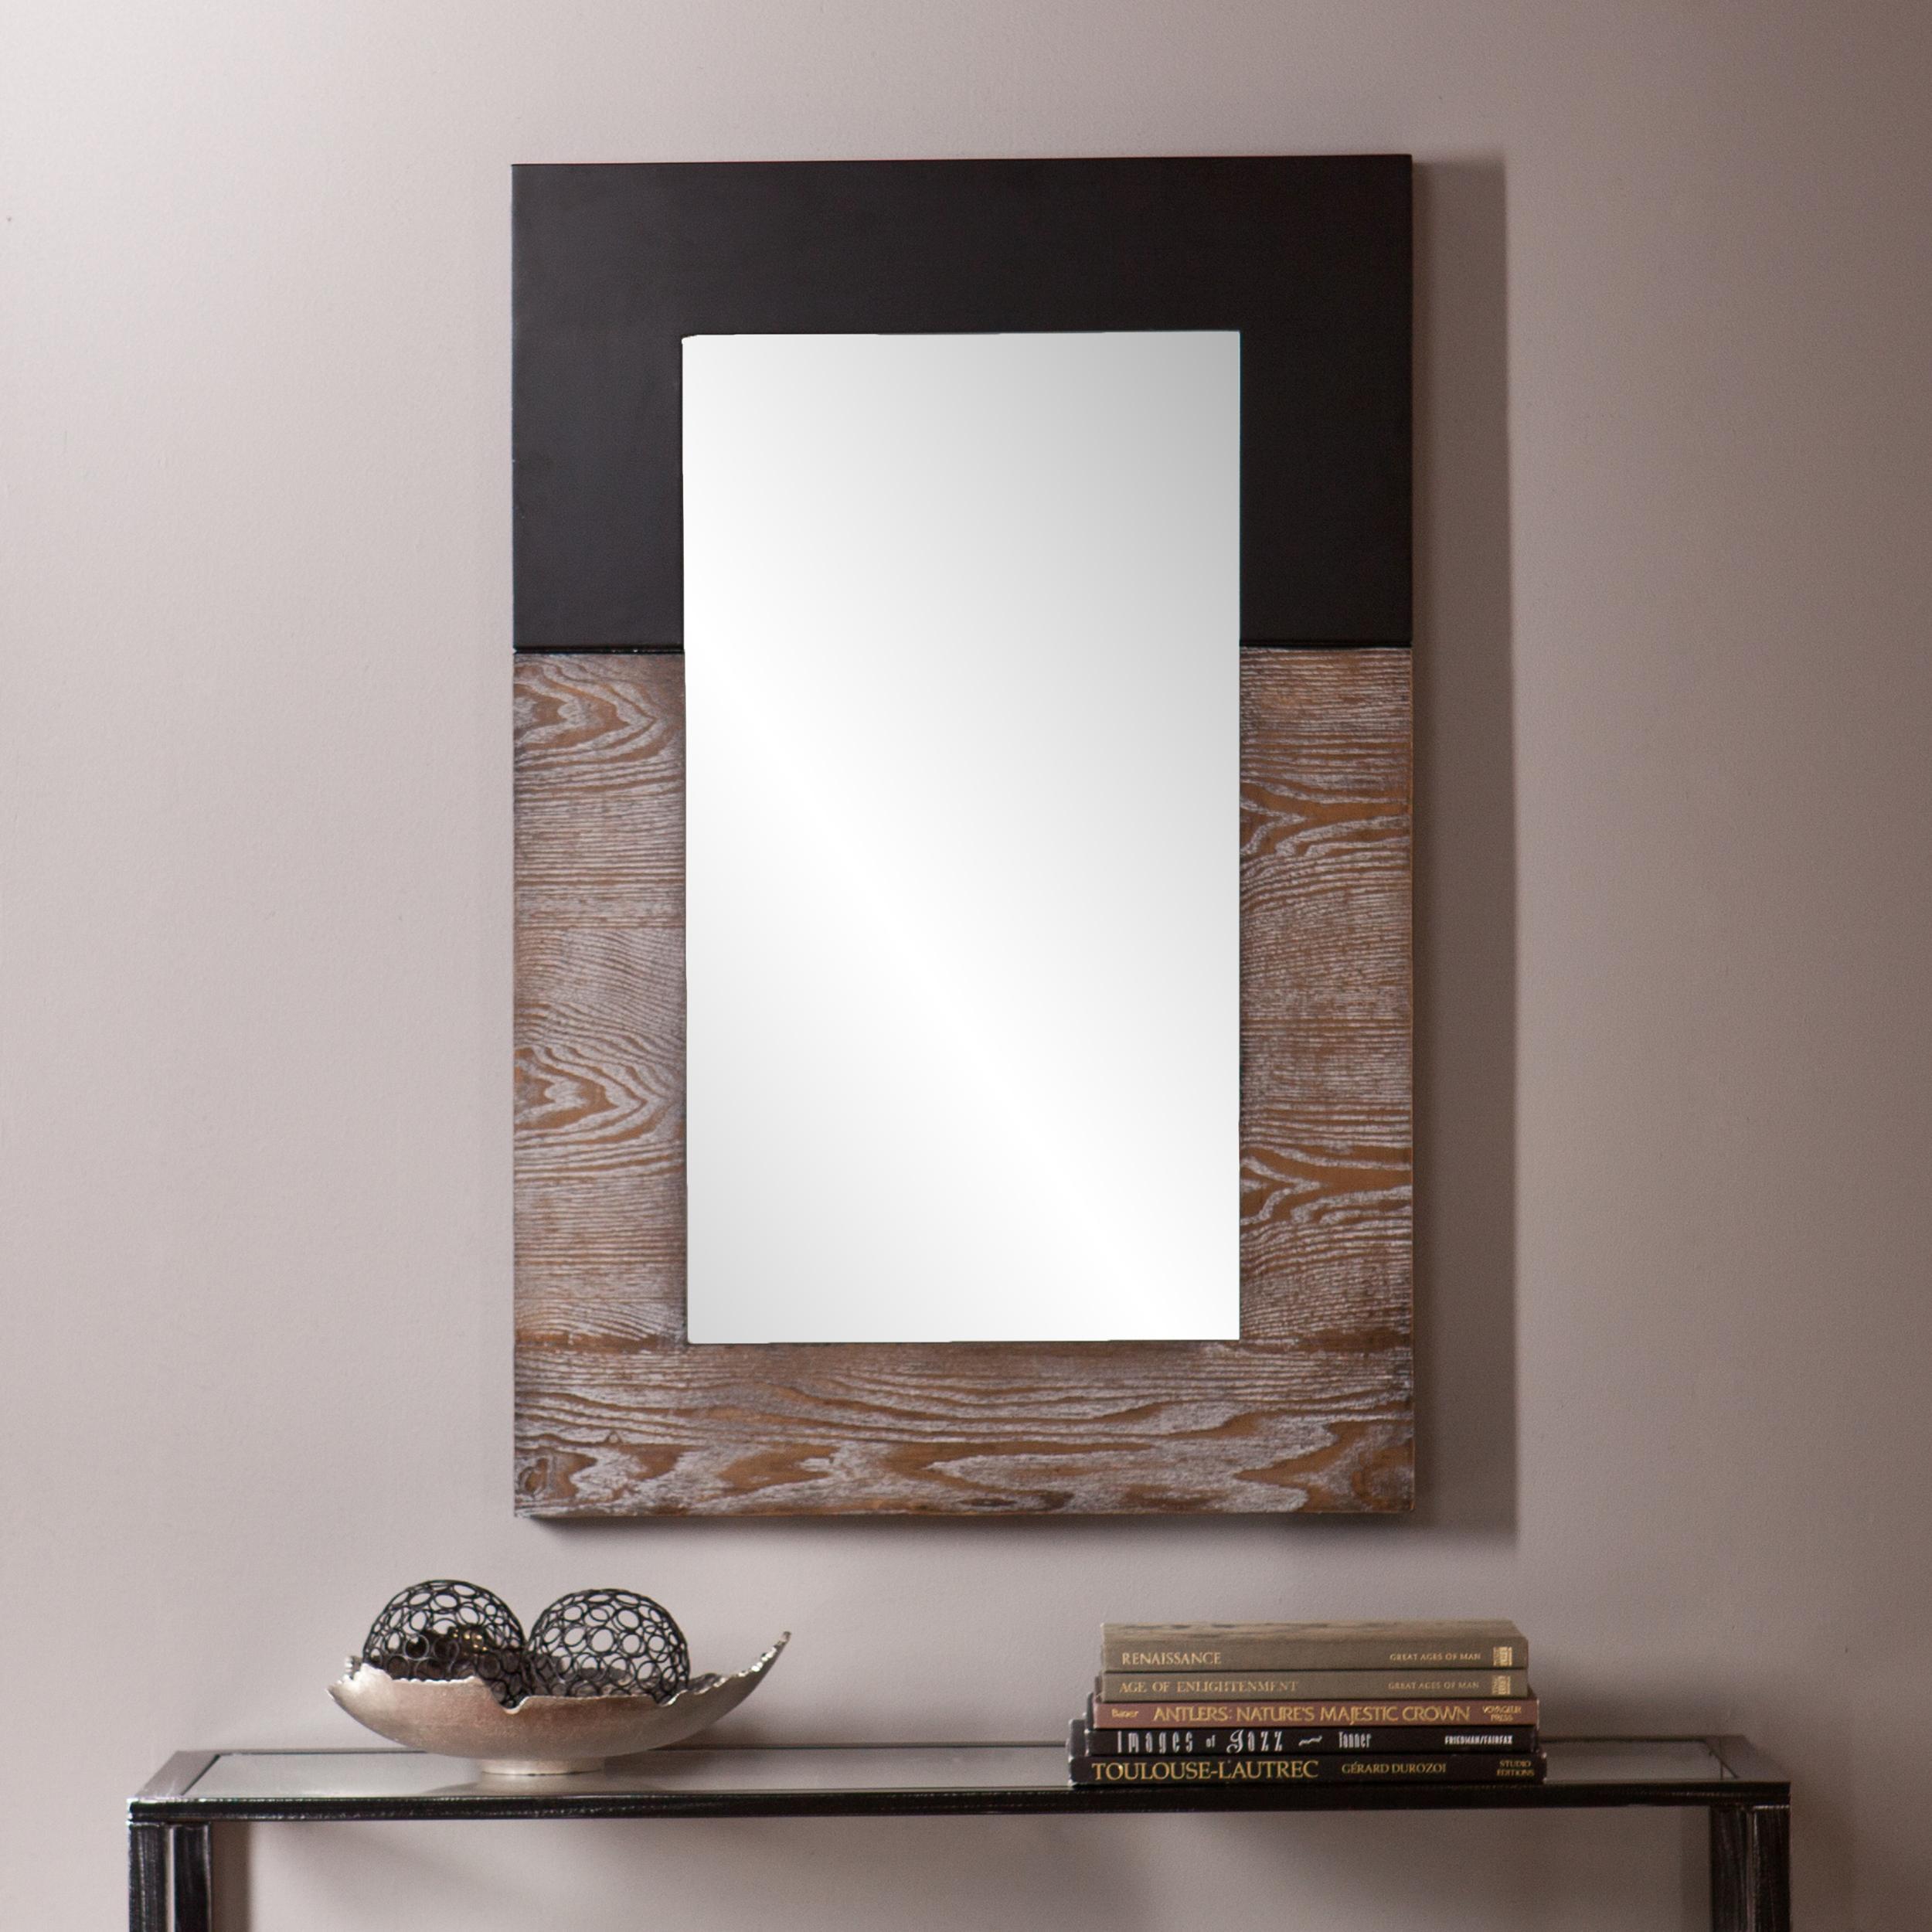 Amazon.com: Southern Enterprises Holly & Martin Wagars Mirror ...